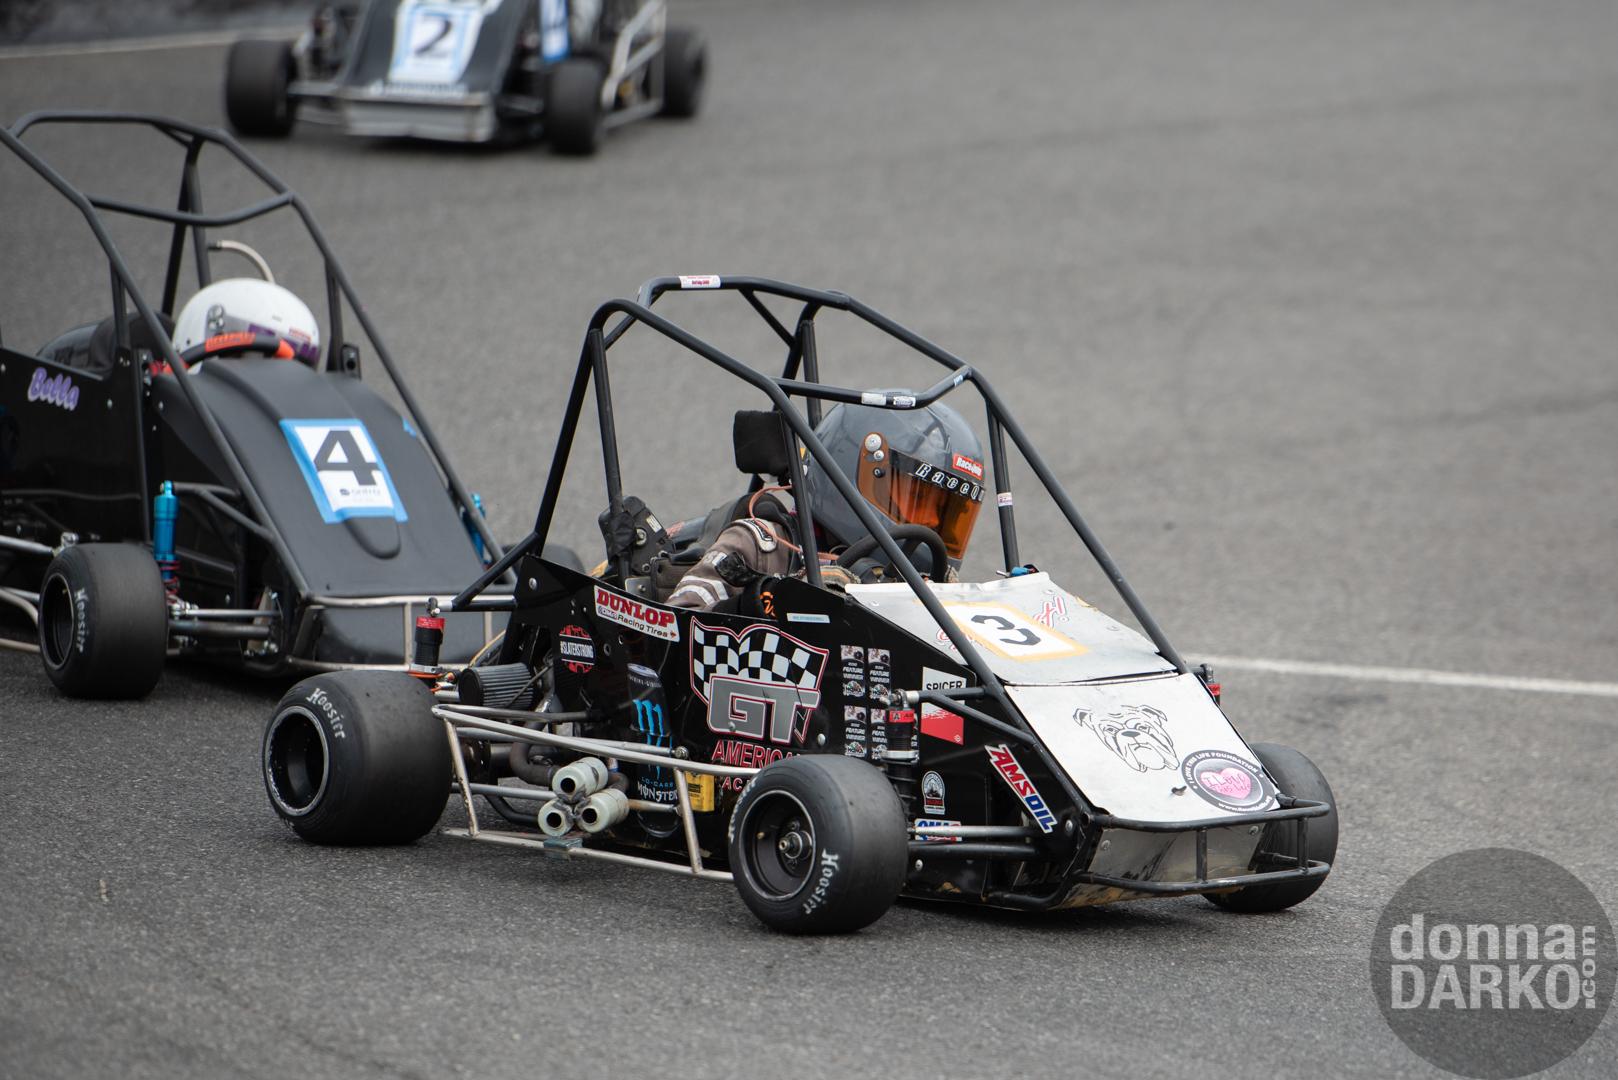 QWMA (Racing) 8-11-2019 DSC_7032.jpg